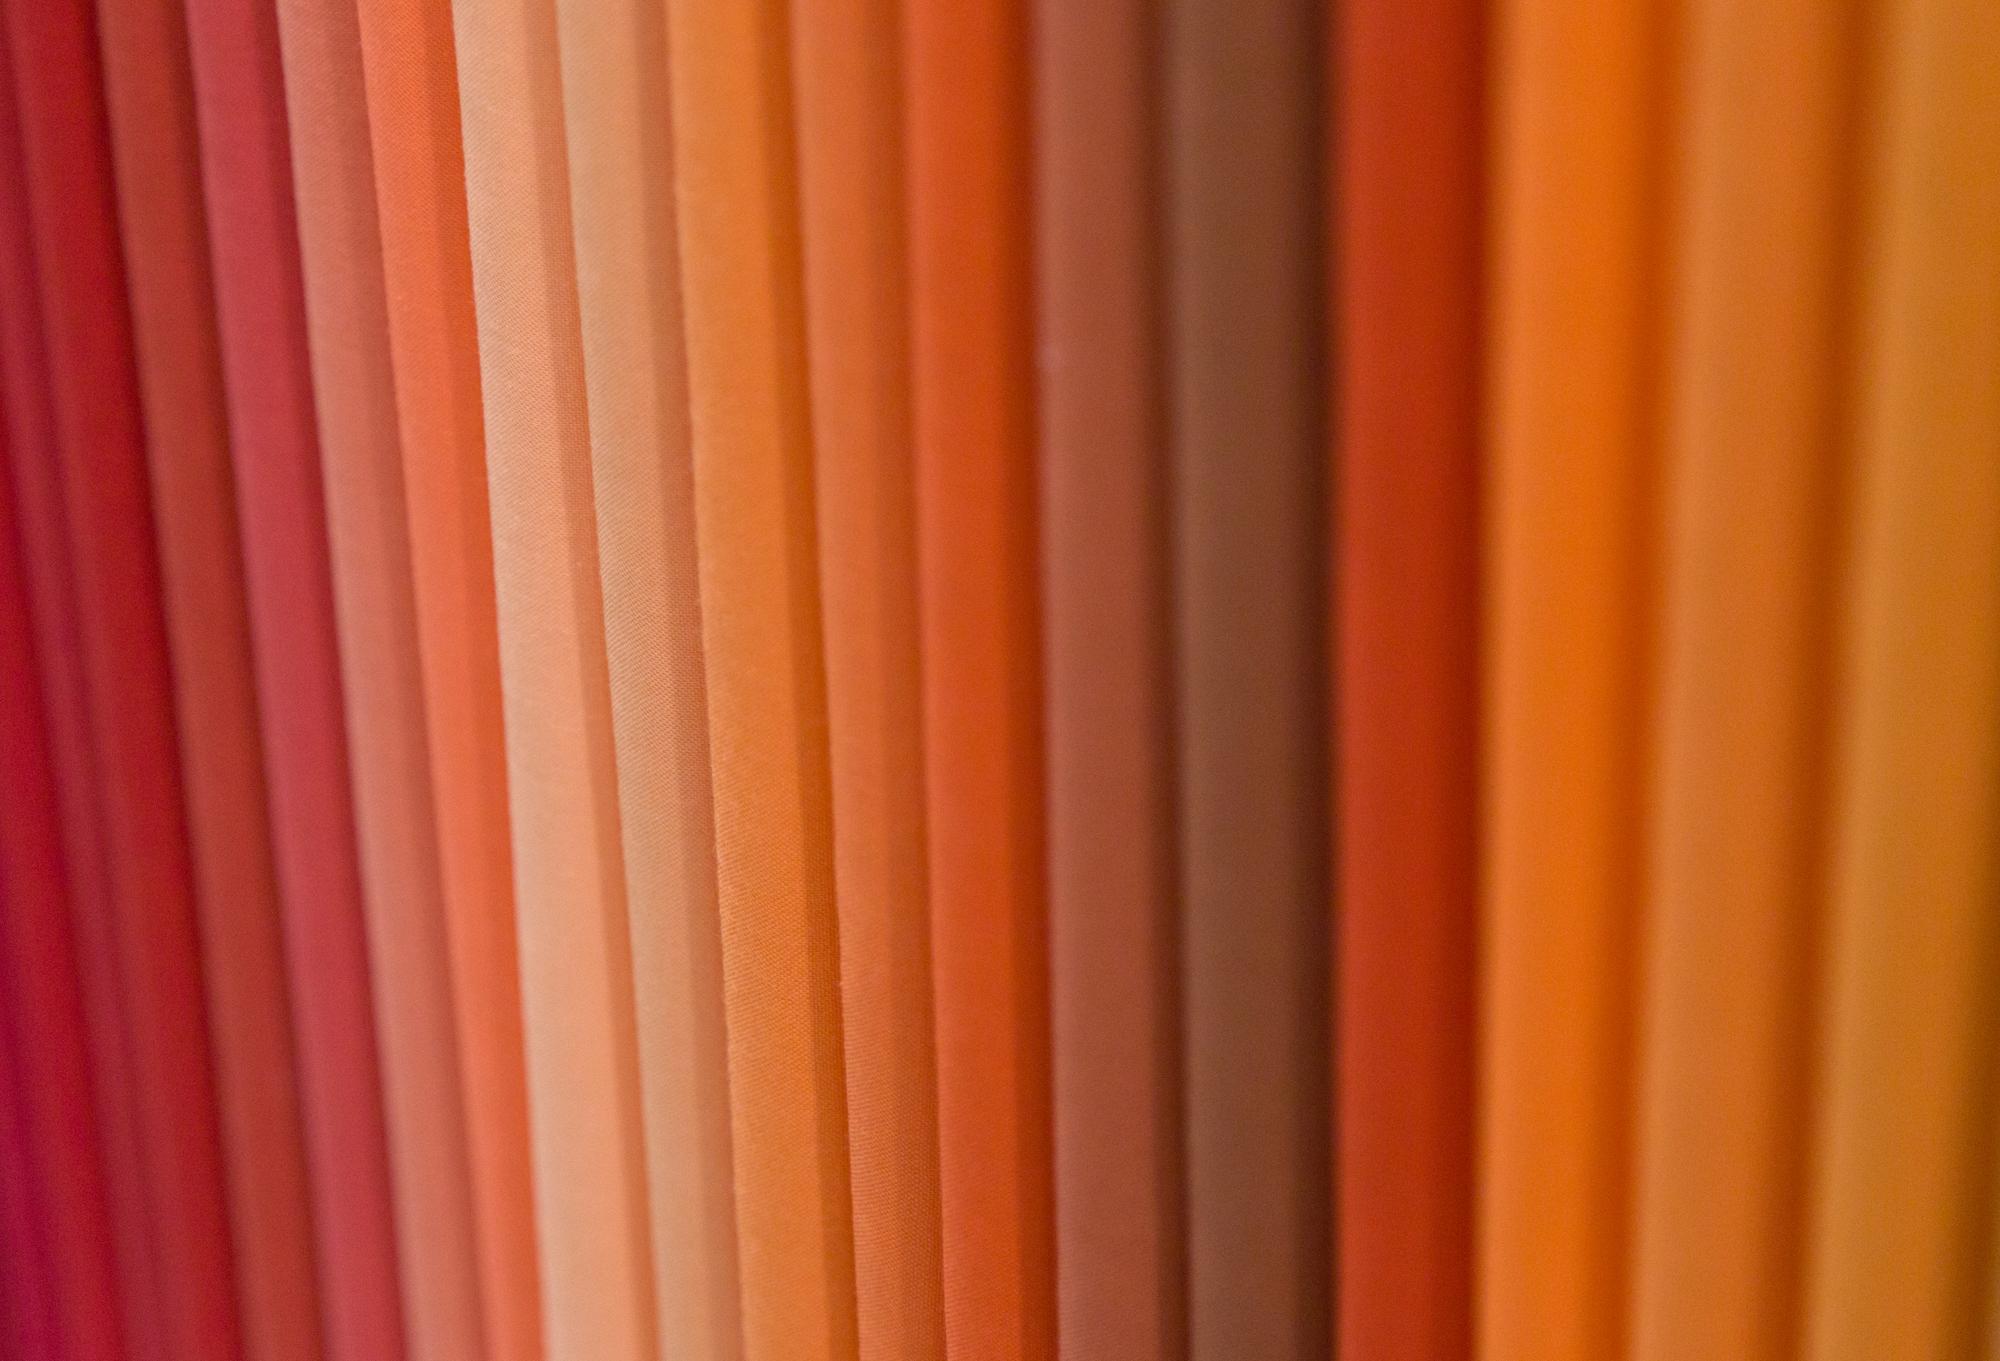 RK_QMfall17_Kona colors wall_06.jpg